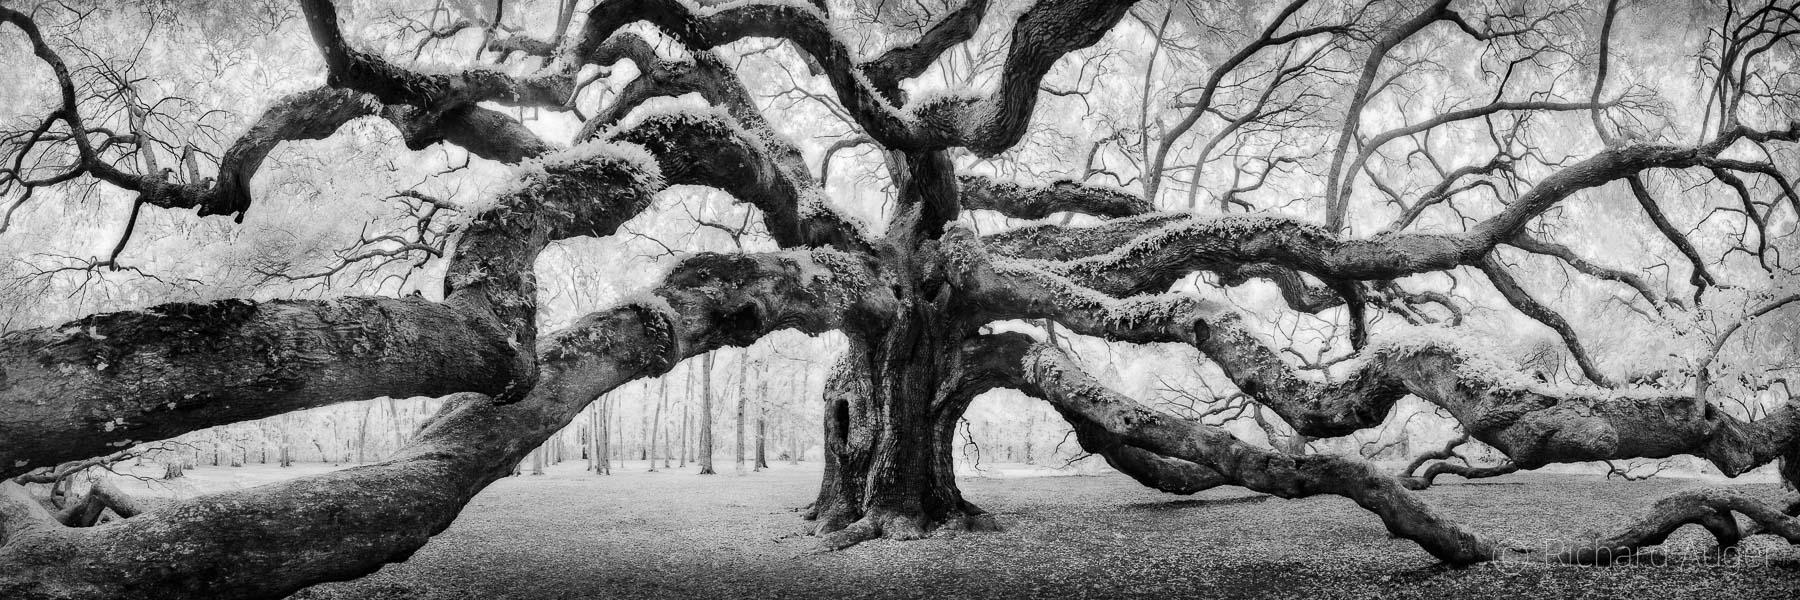 Angel Oak, South Carolina, Oak Tree, Spooky, forest, photographer, landscape, photograph, black and white, panorama